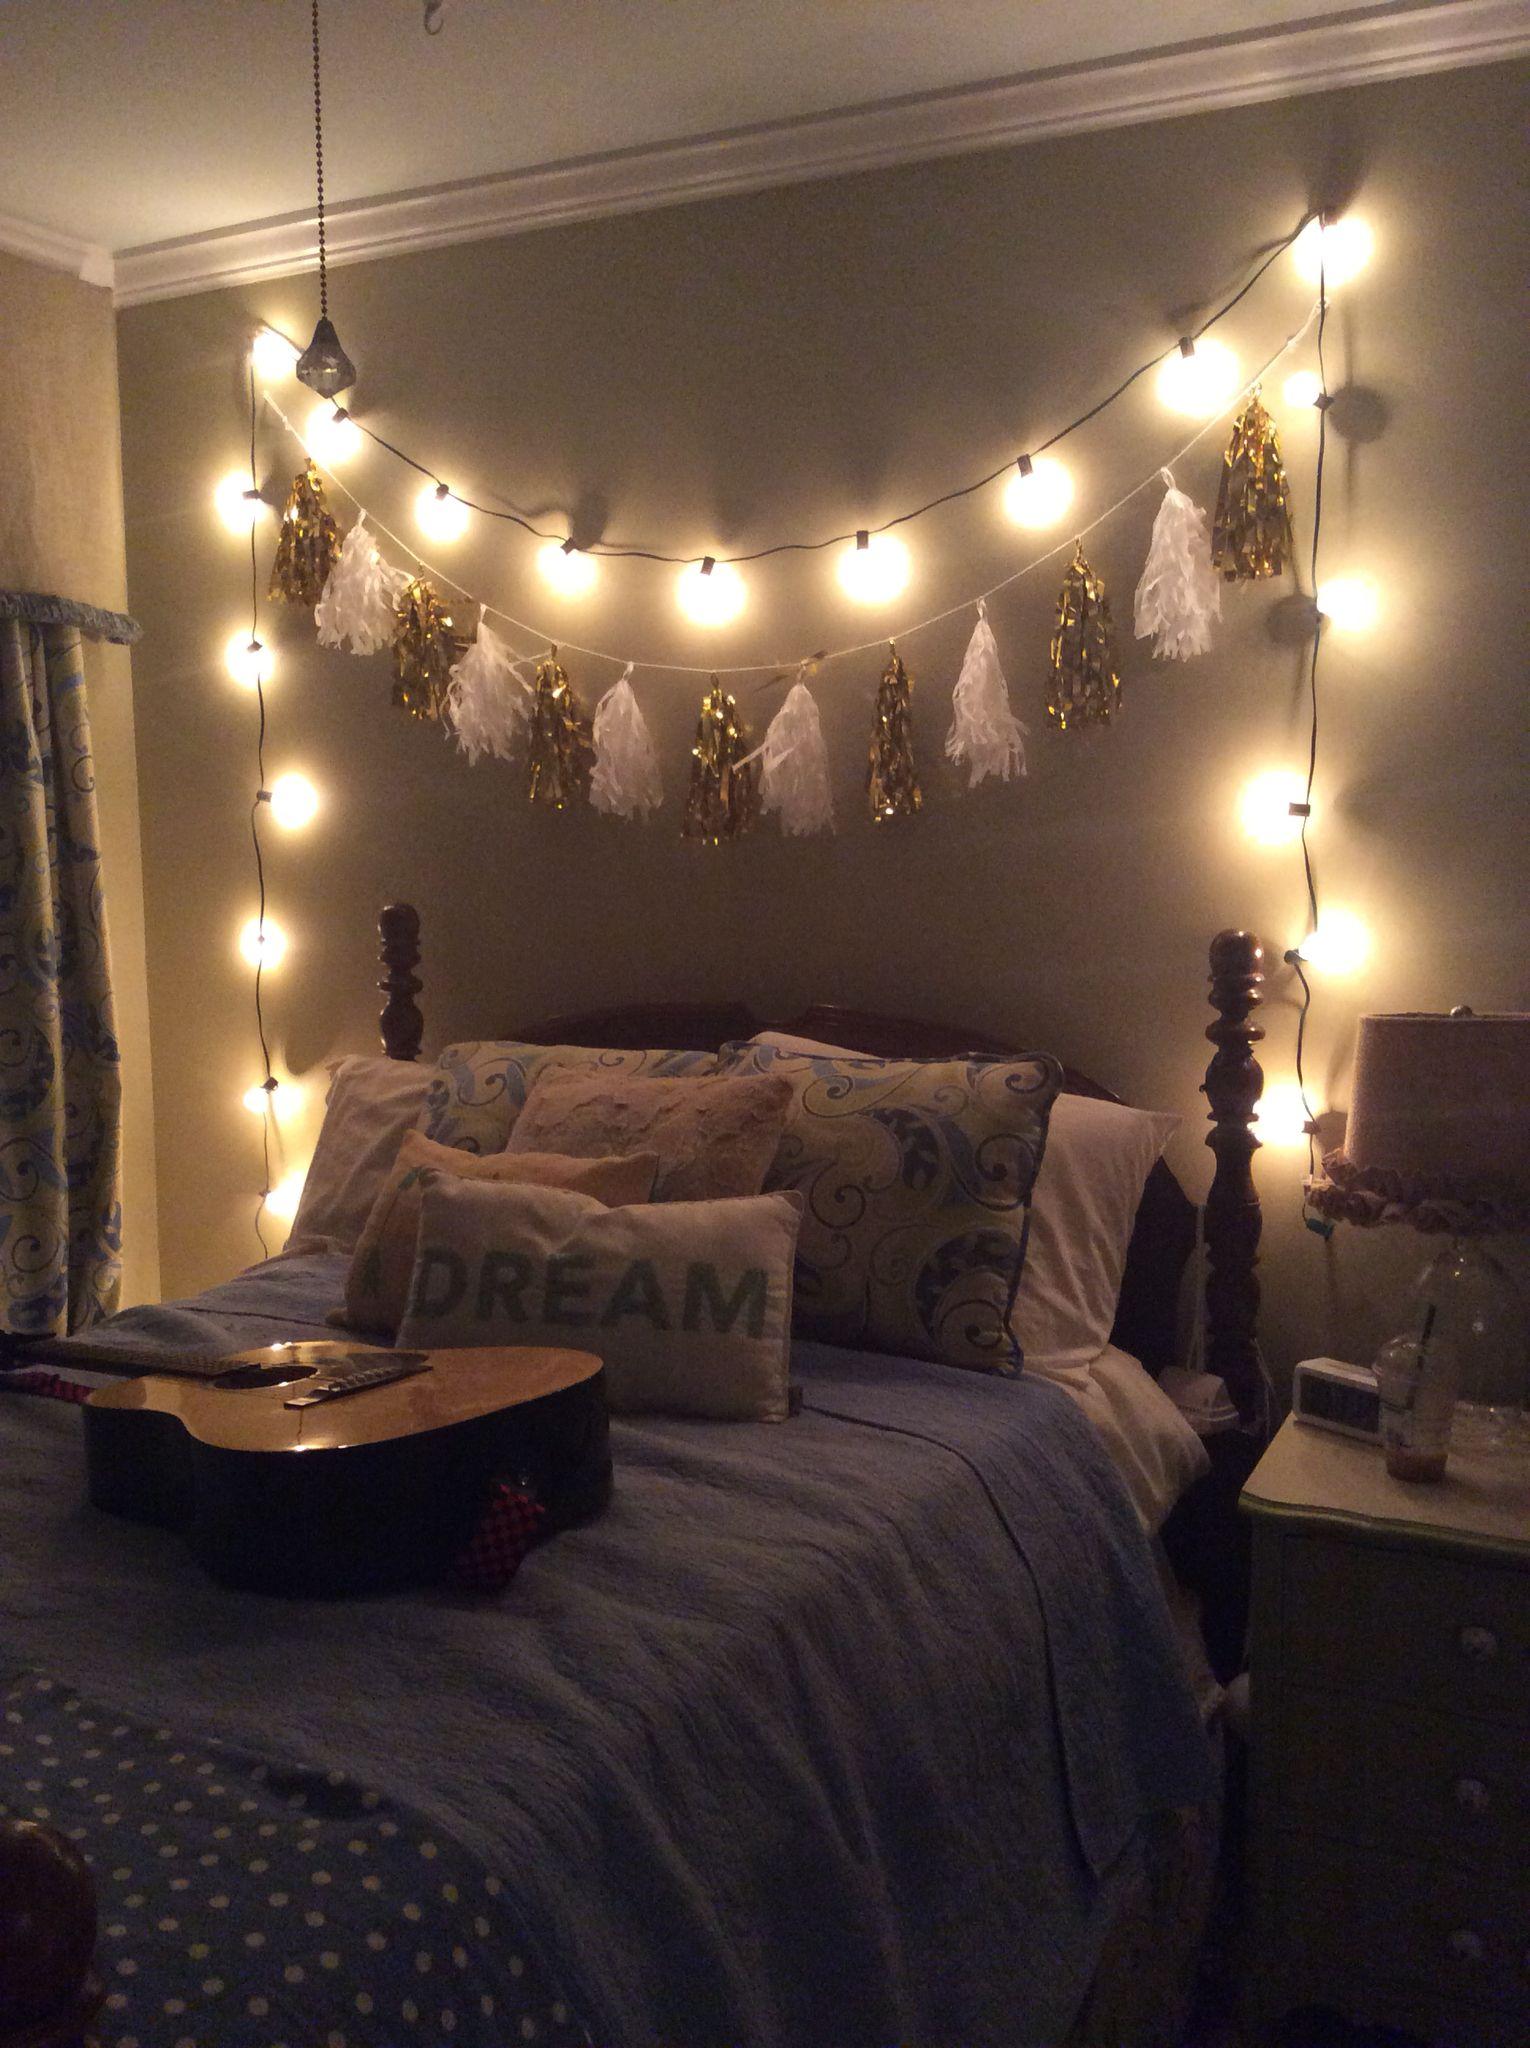 Future House, Dream Rooms, Bedroom Ideas, Diy Ideas, Beds, Quartos,